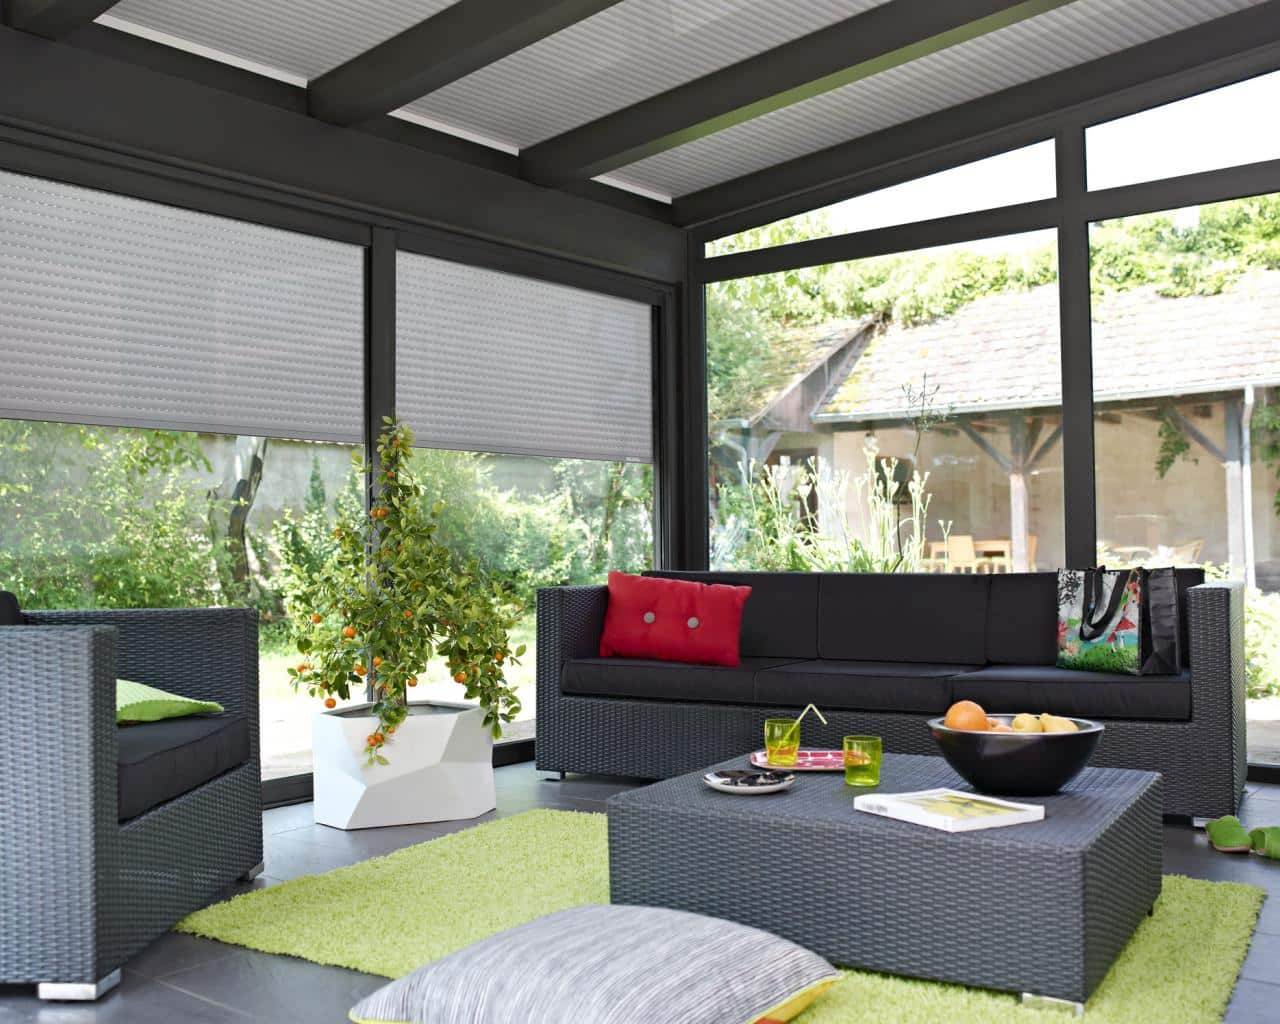 protections solaires cei habitat. Black Bedroom Furniture Sets. Home Design Ideas